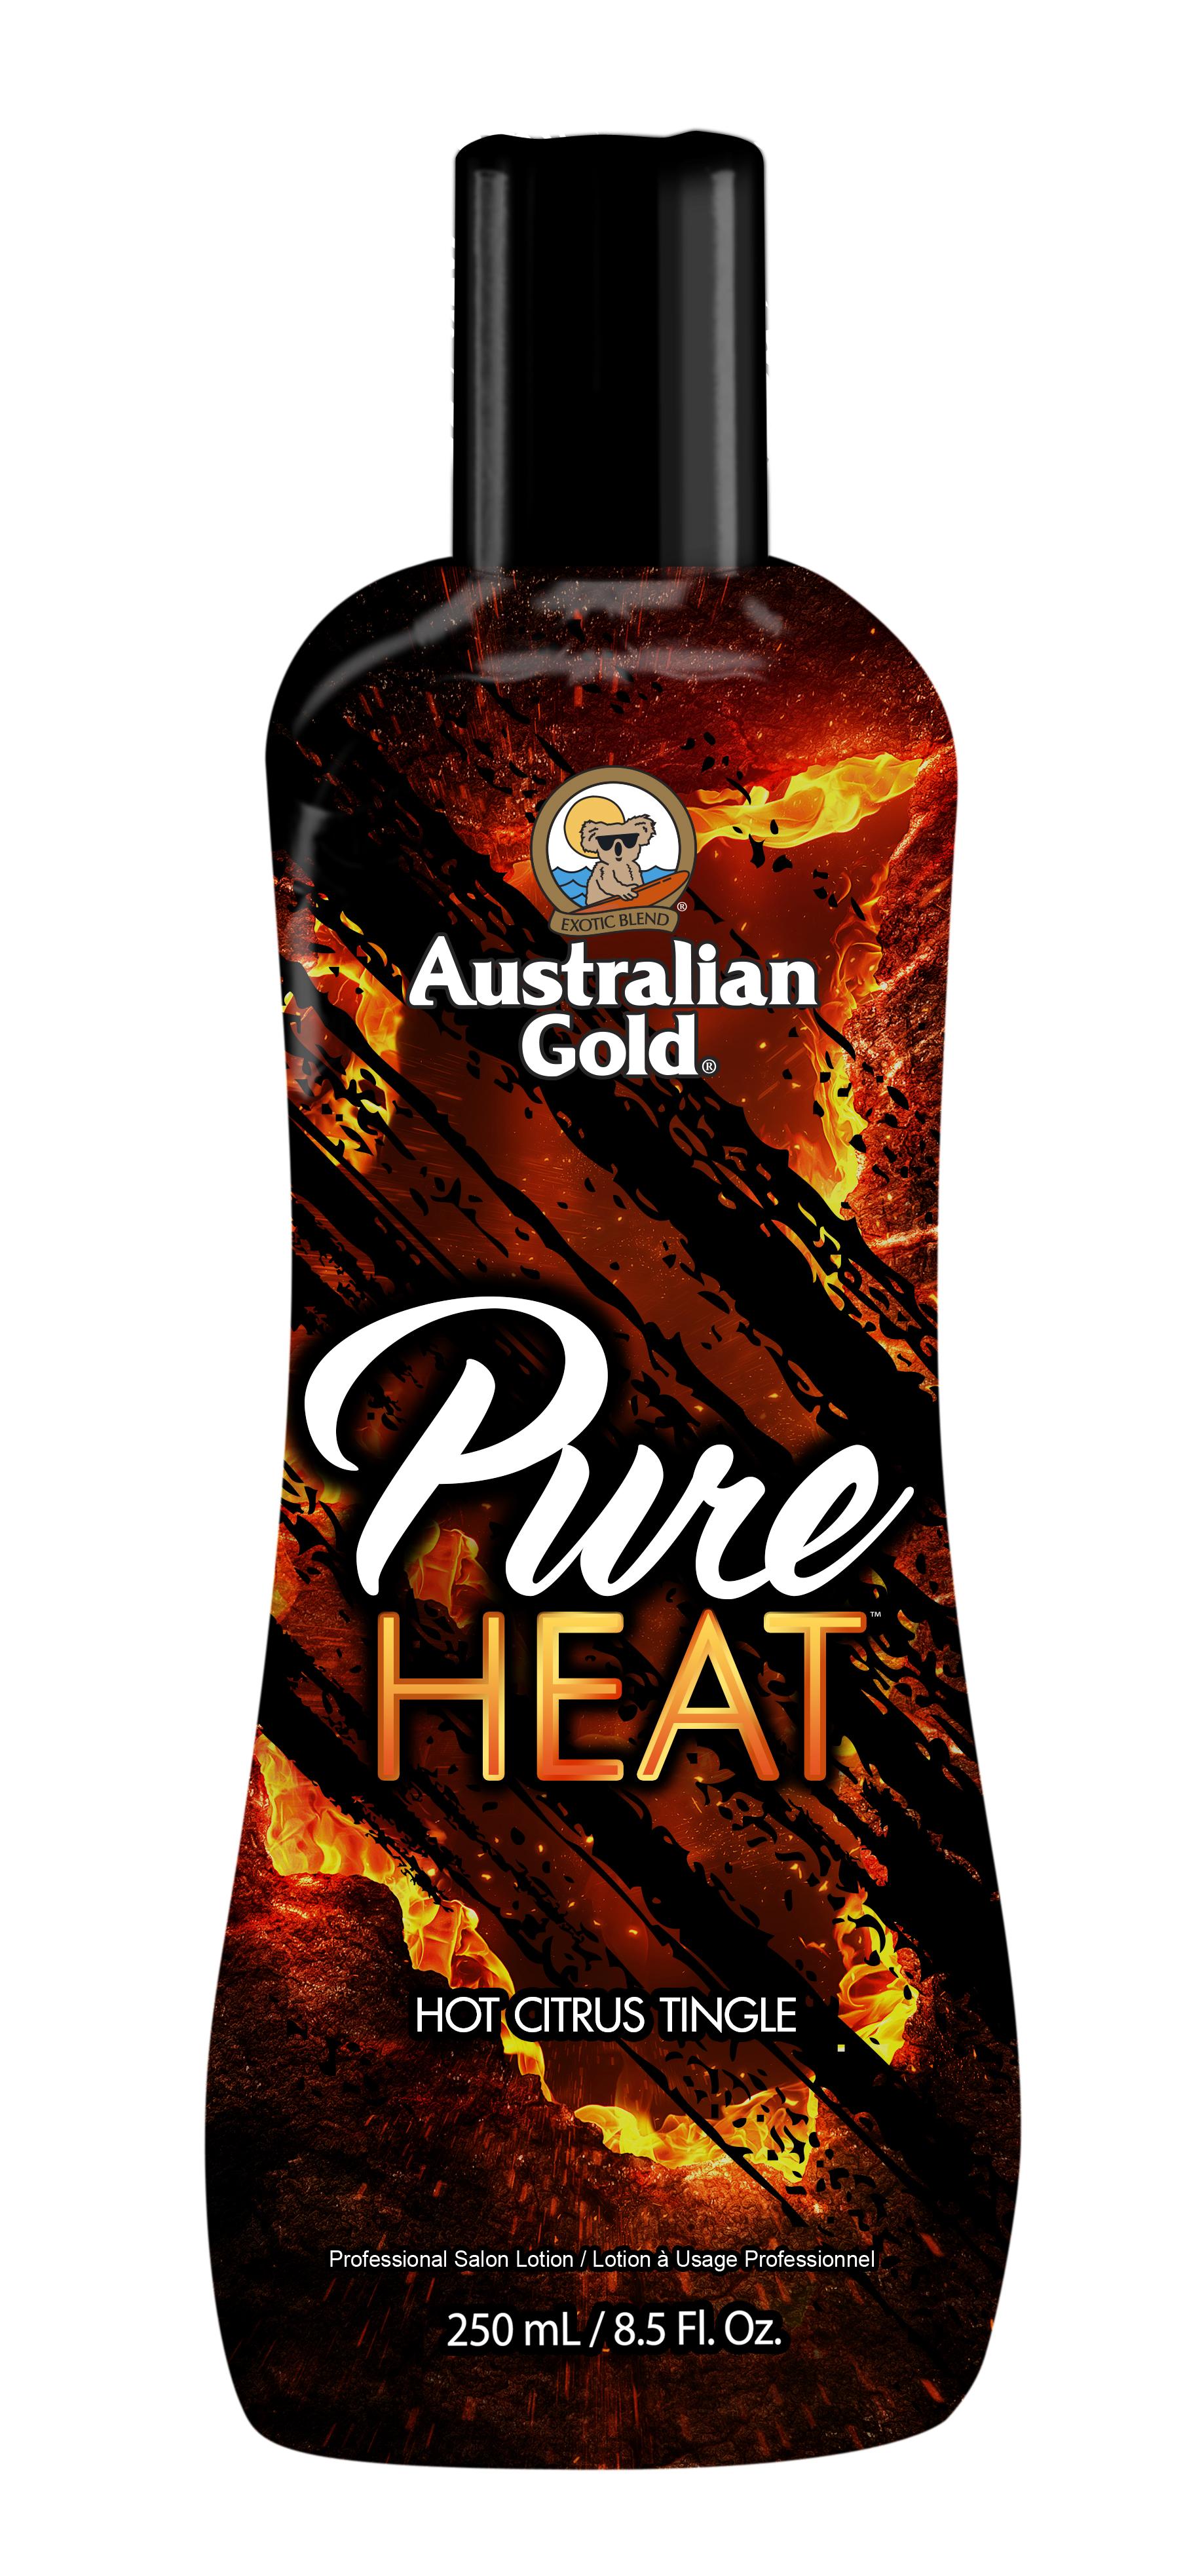 Pure Heat™ Hot Citrus Tingle